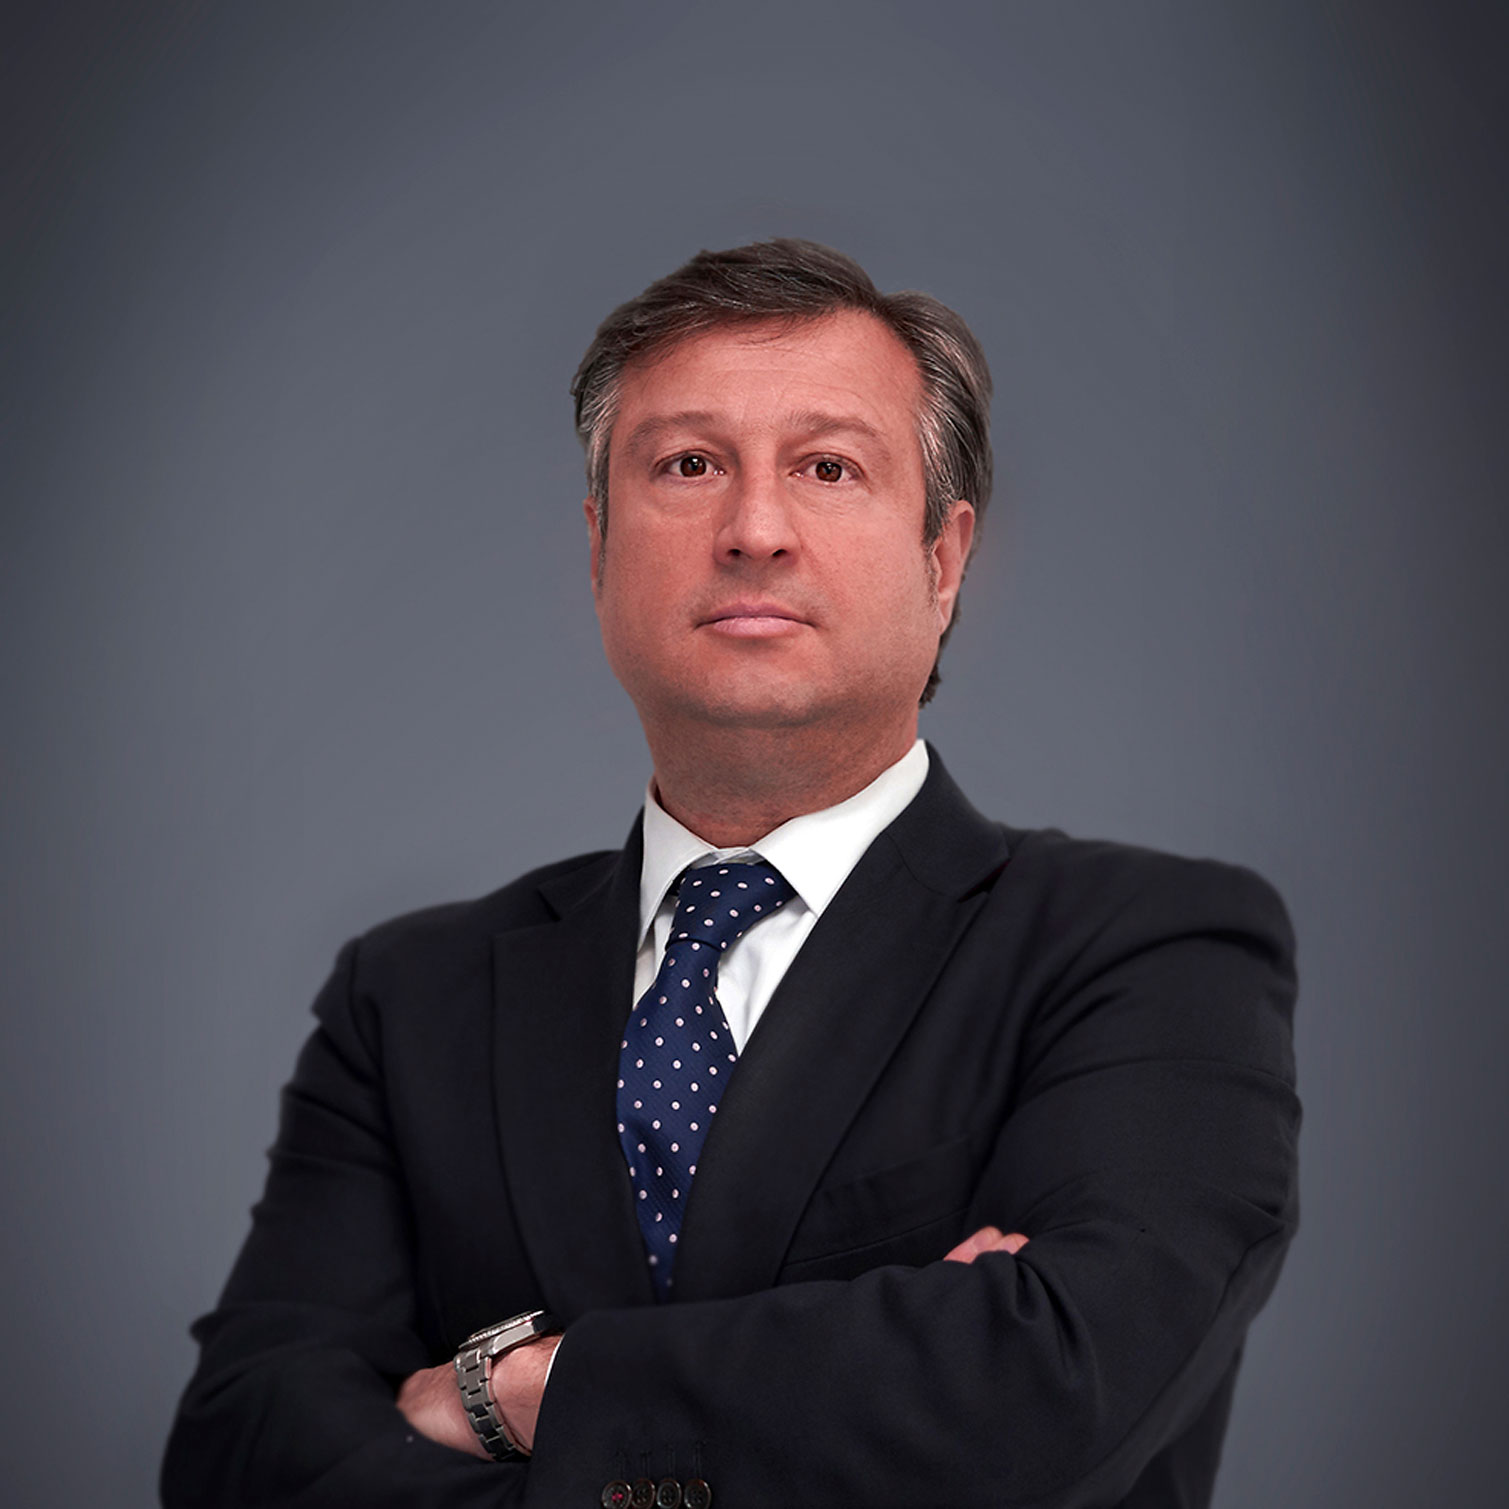 Javier Gutiérrez Llamazares